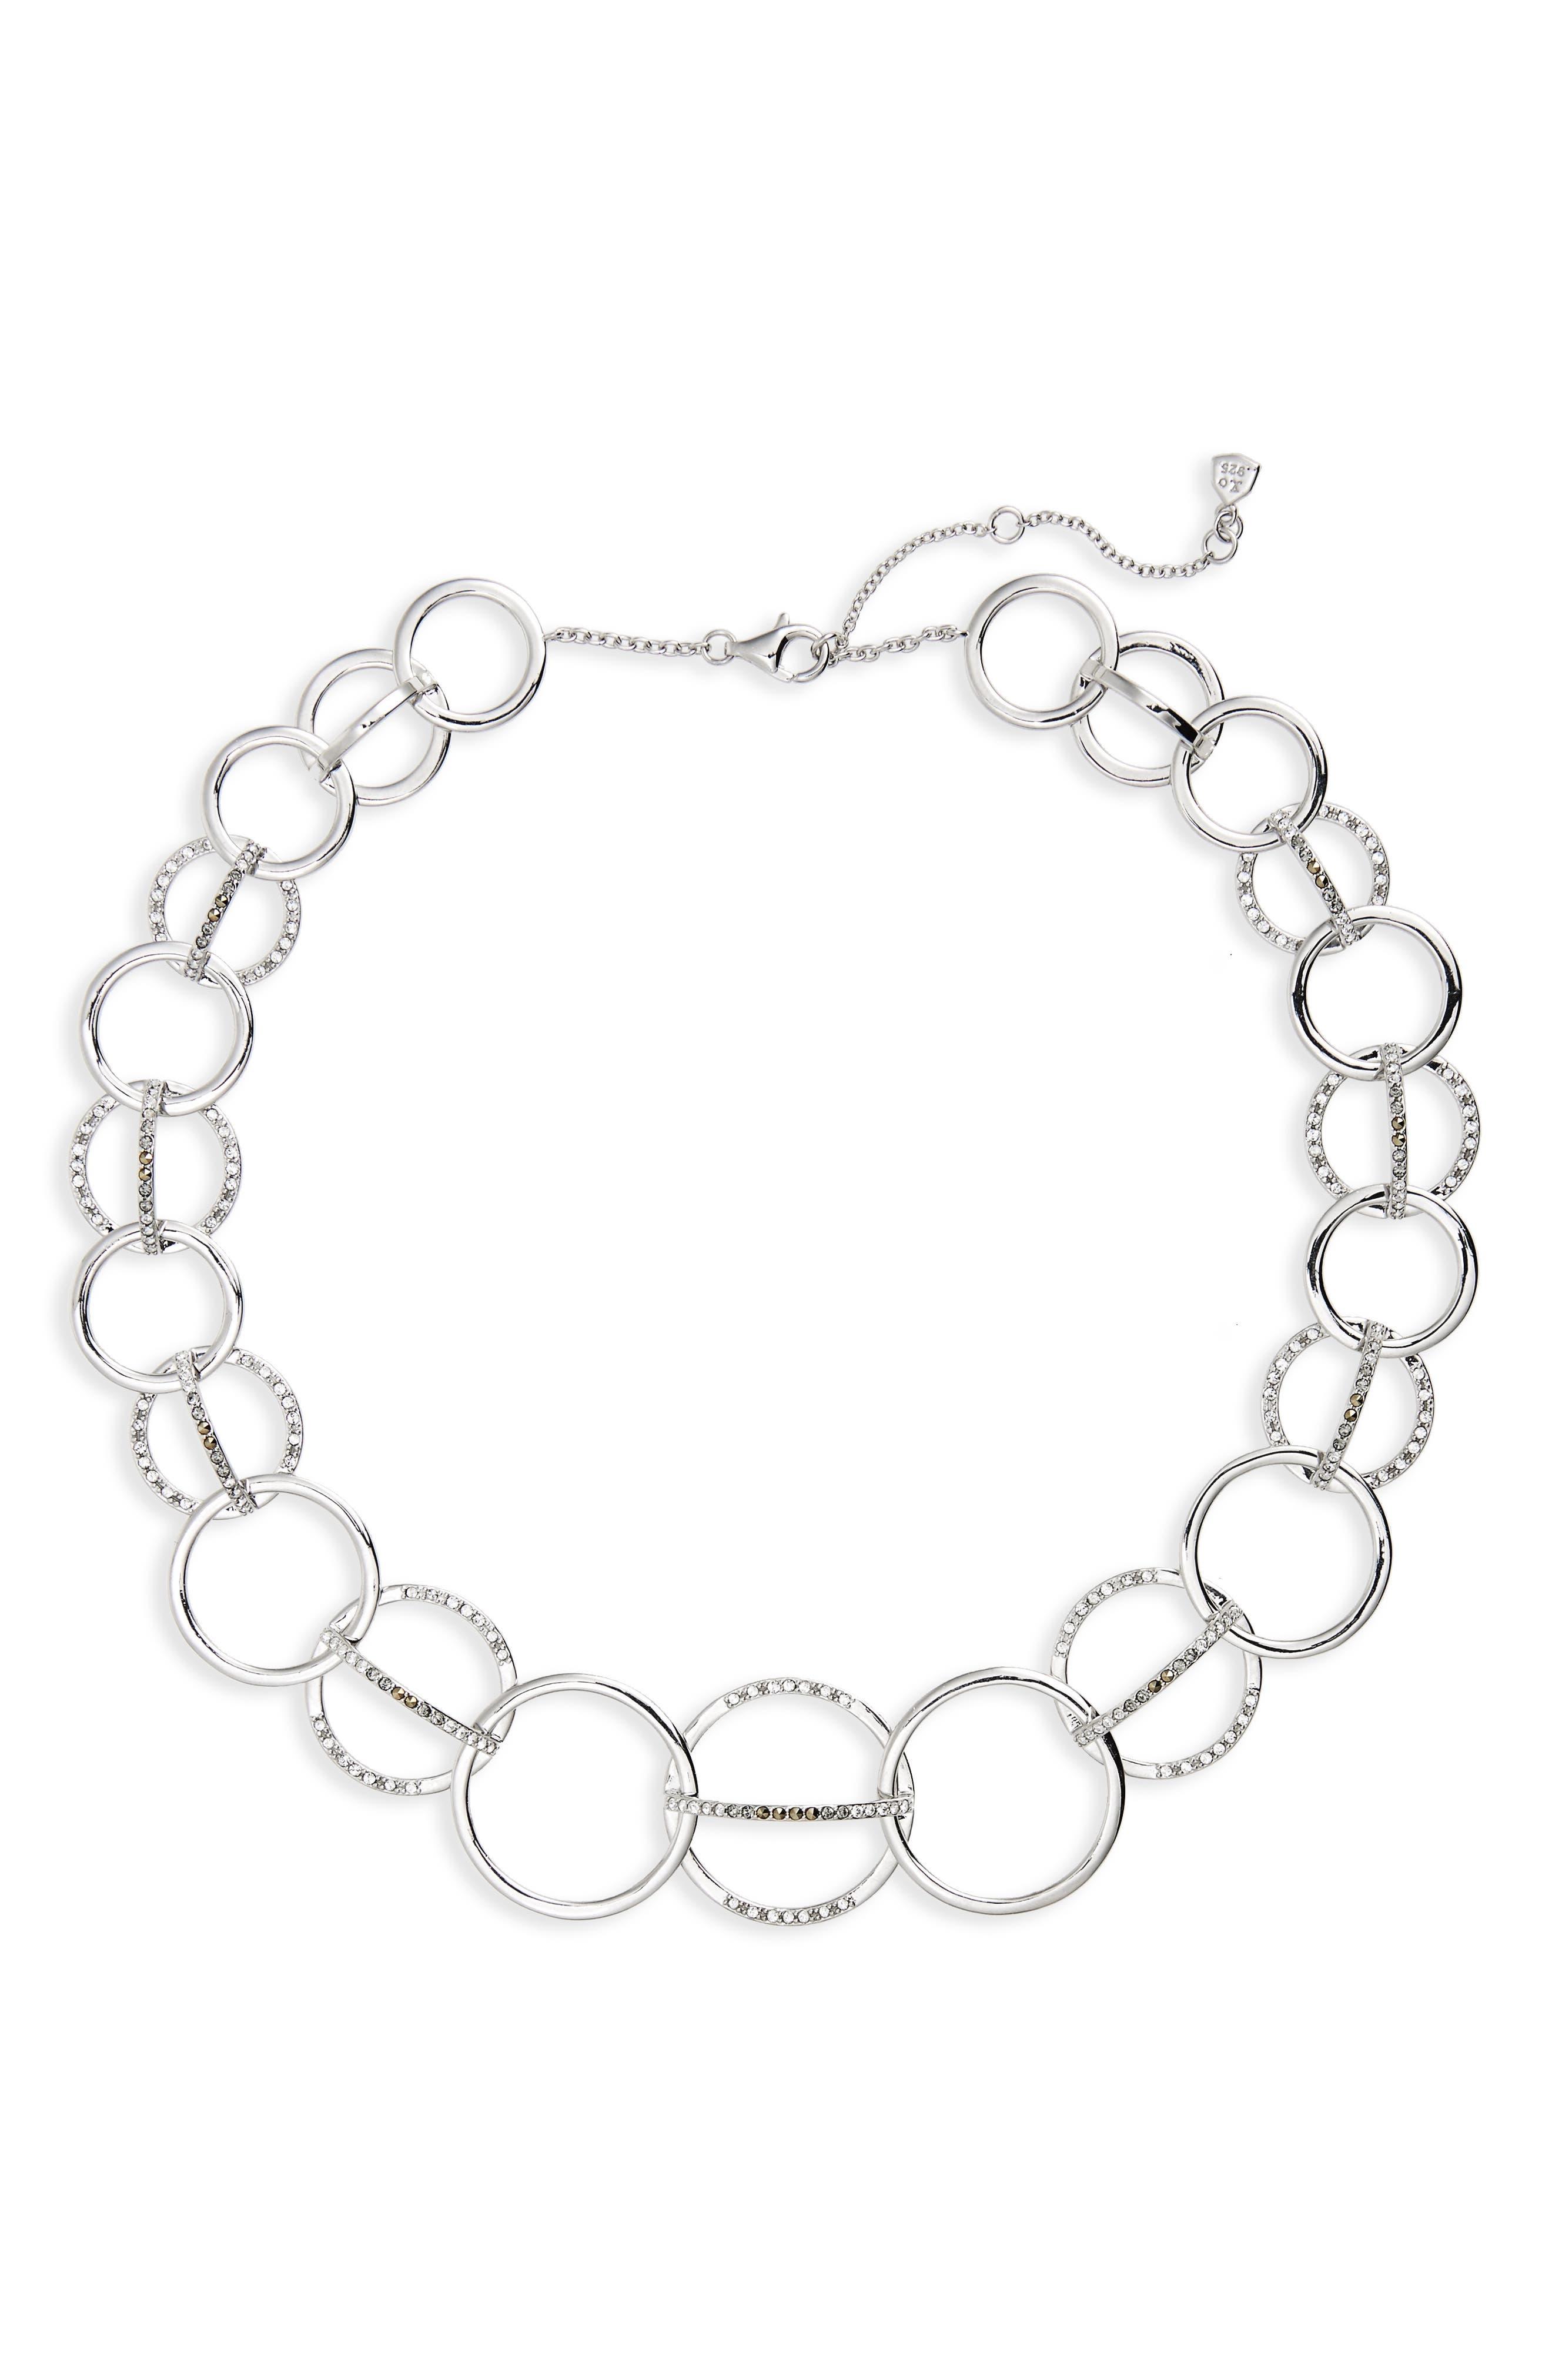 Silver Sparkle Collar Necklace,                             Main thumbnail 1, color,                             Black Diamond/ Marcasite